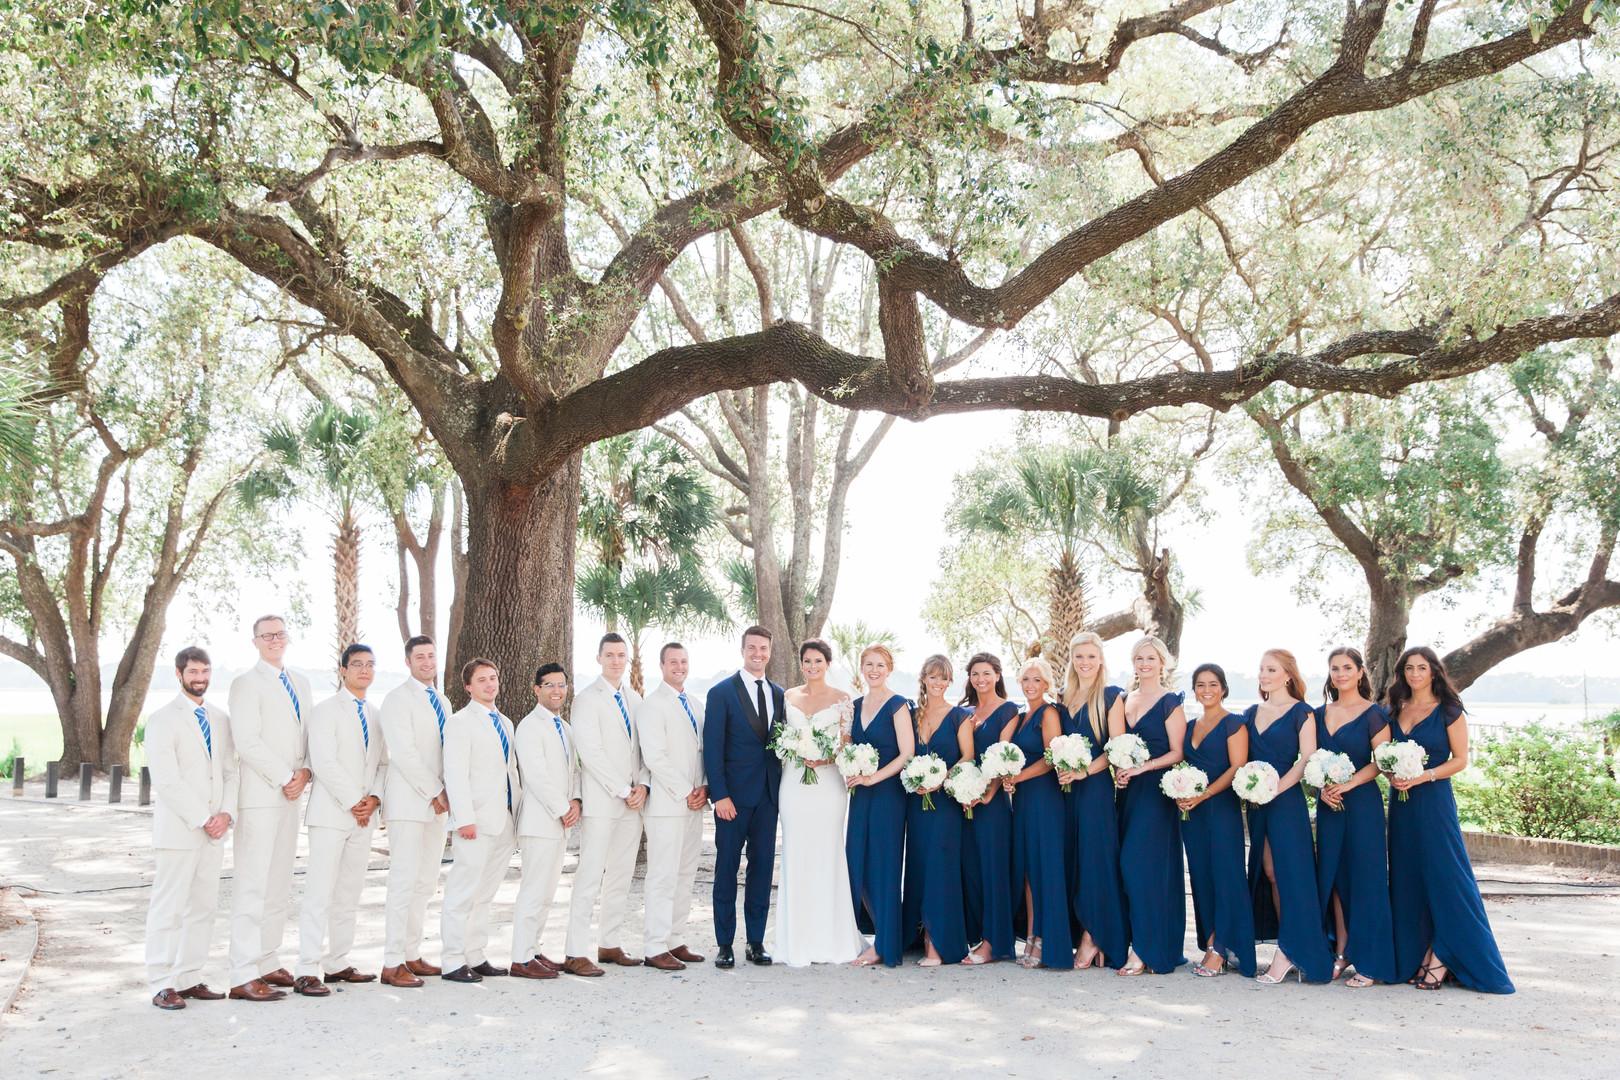 lowndes-grove-wedding-60.jpg